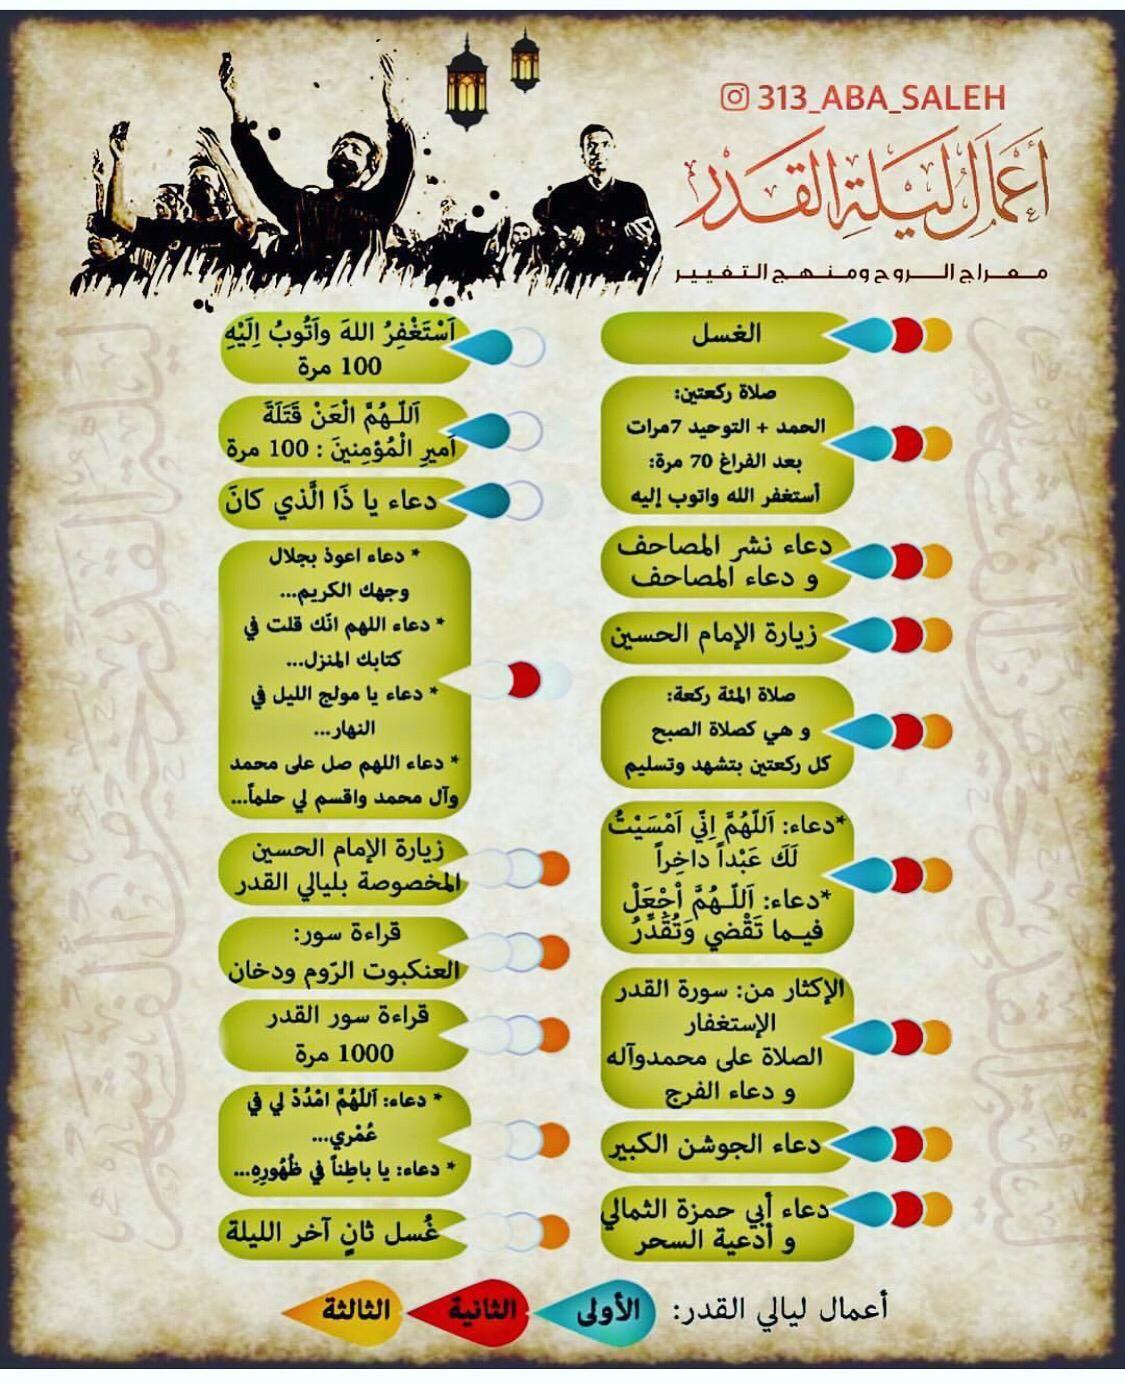 Pin By 313 Aba Saleh On 313 Aba Saleh